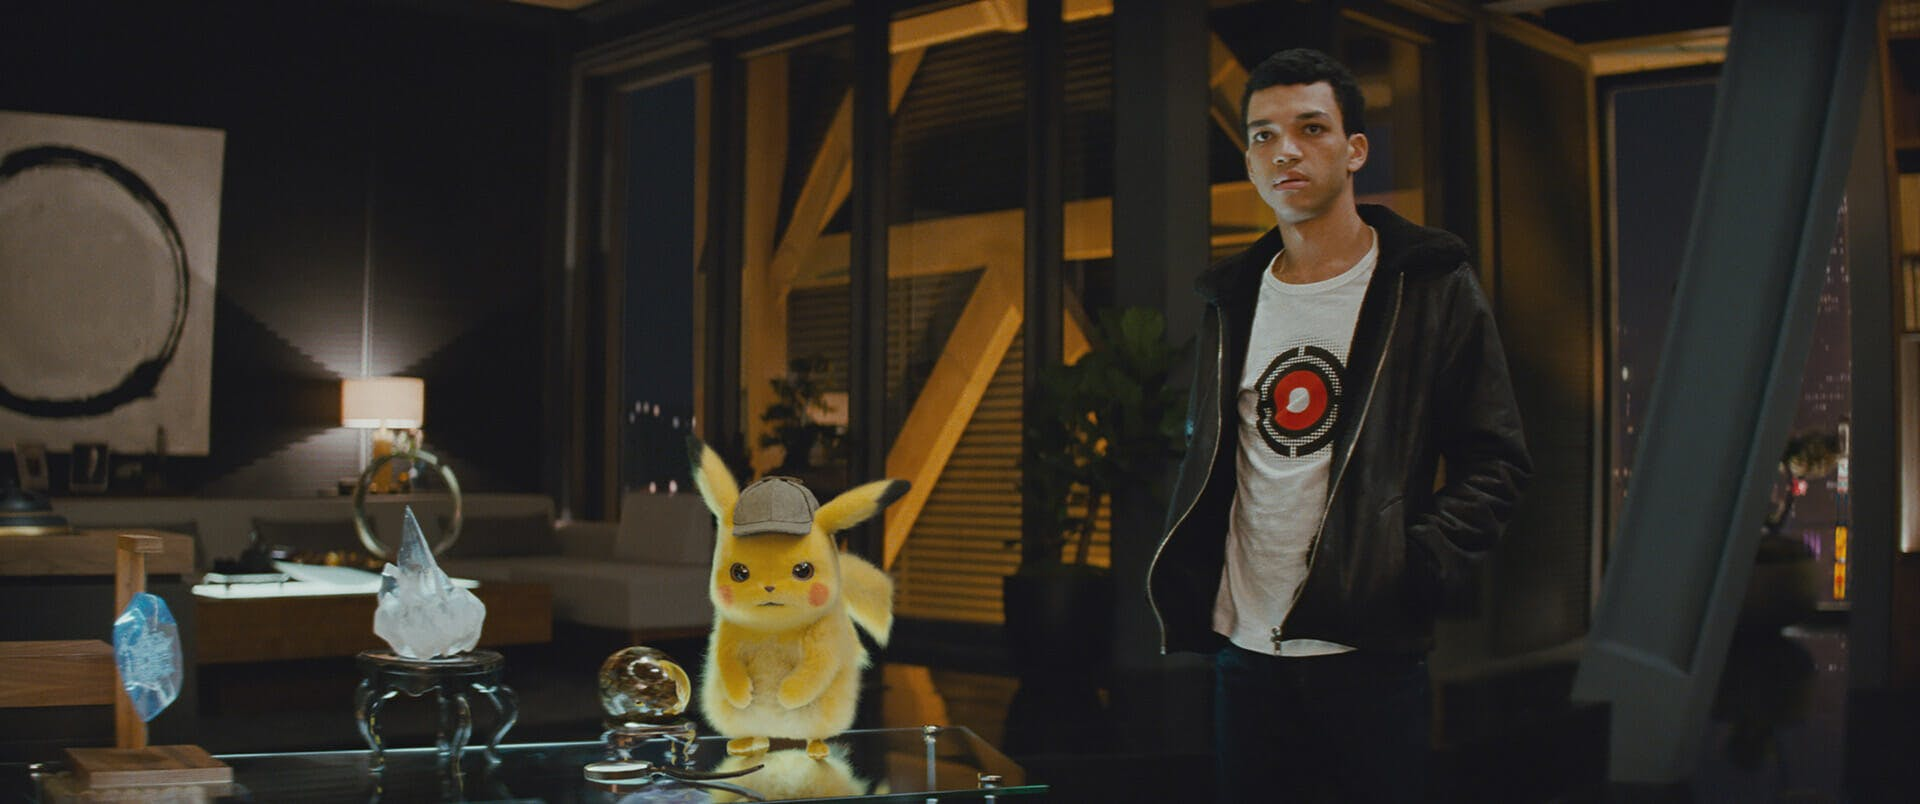 detective pikachu review 2